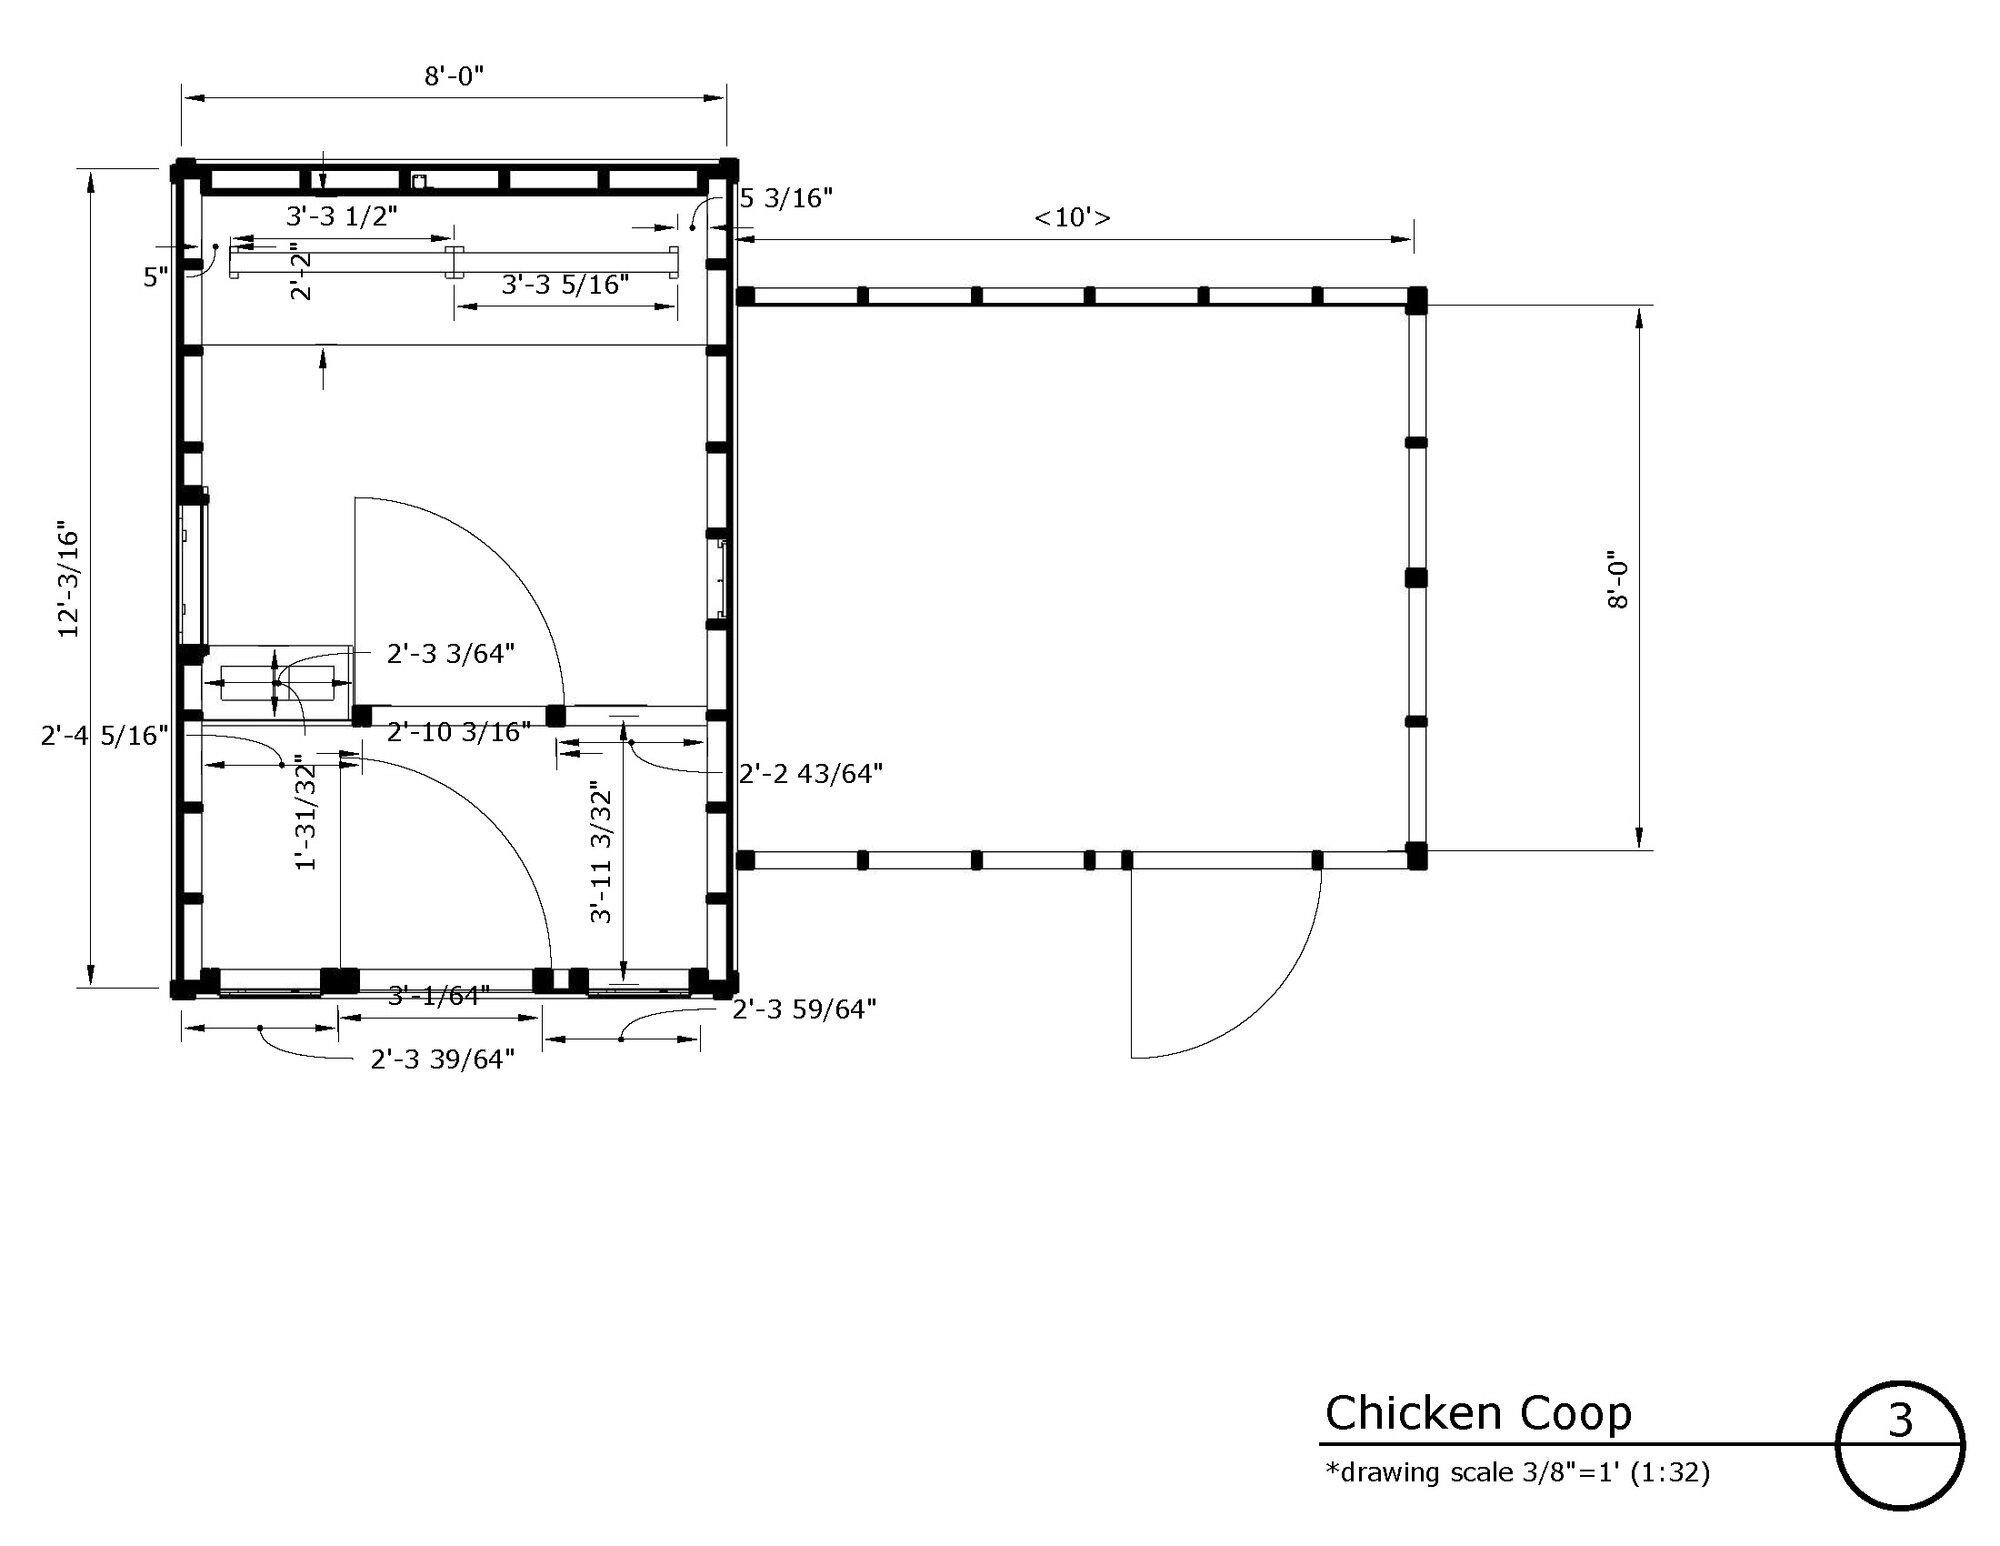 Chicken coop blueprints_Page_3.jpg